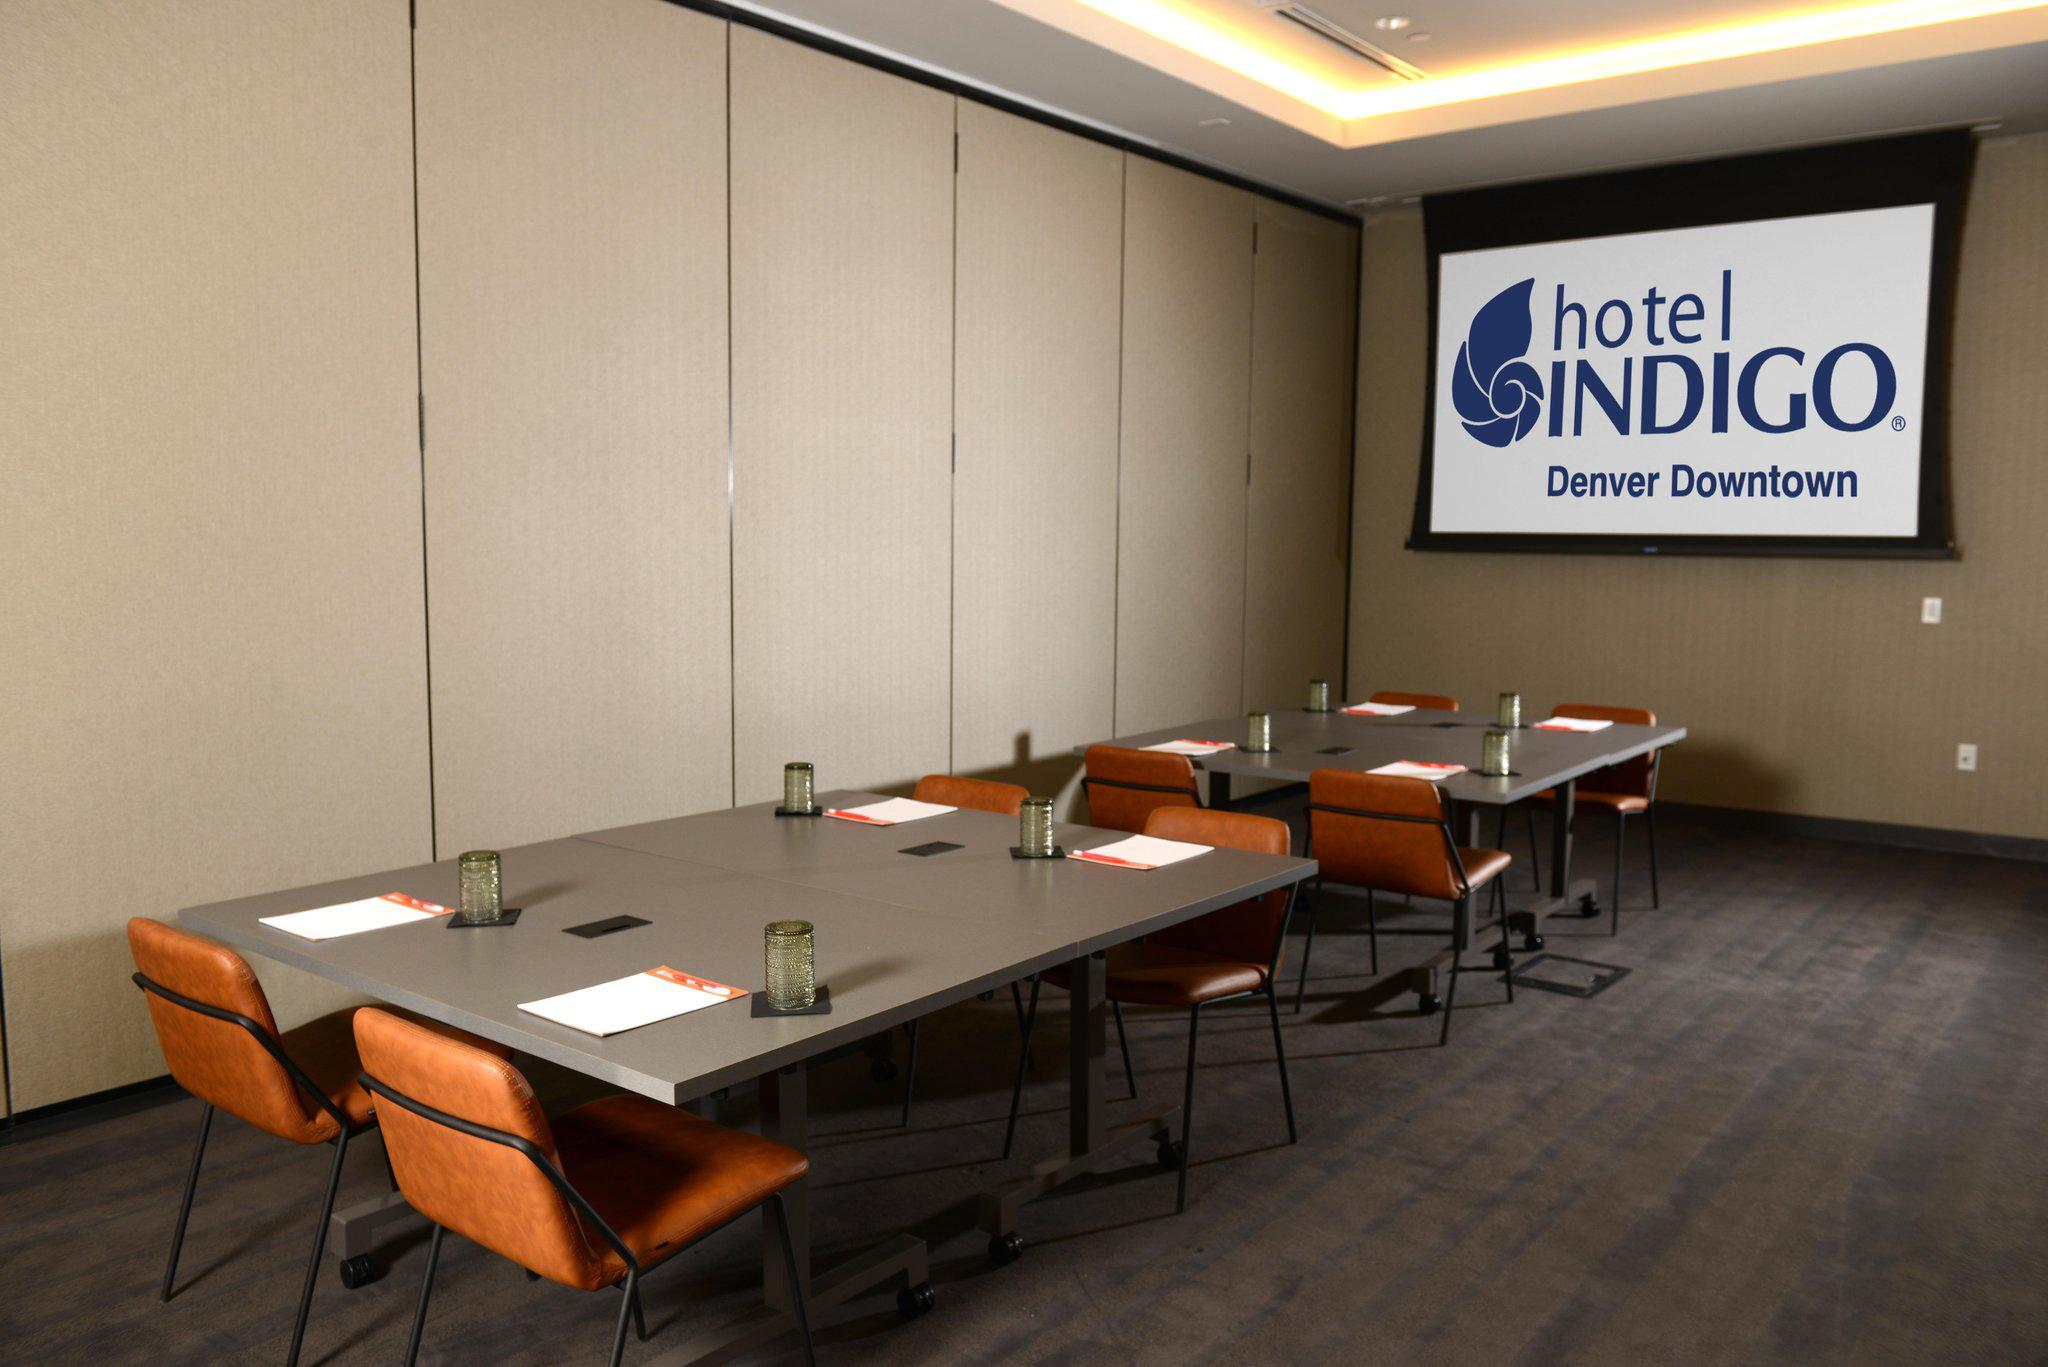 Hotel Indigo Denver Downtown-Union Station